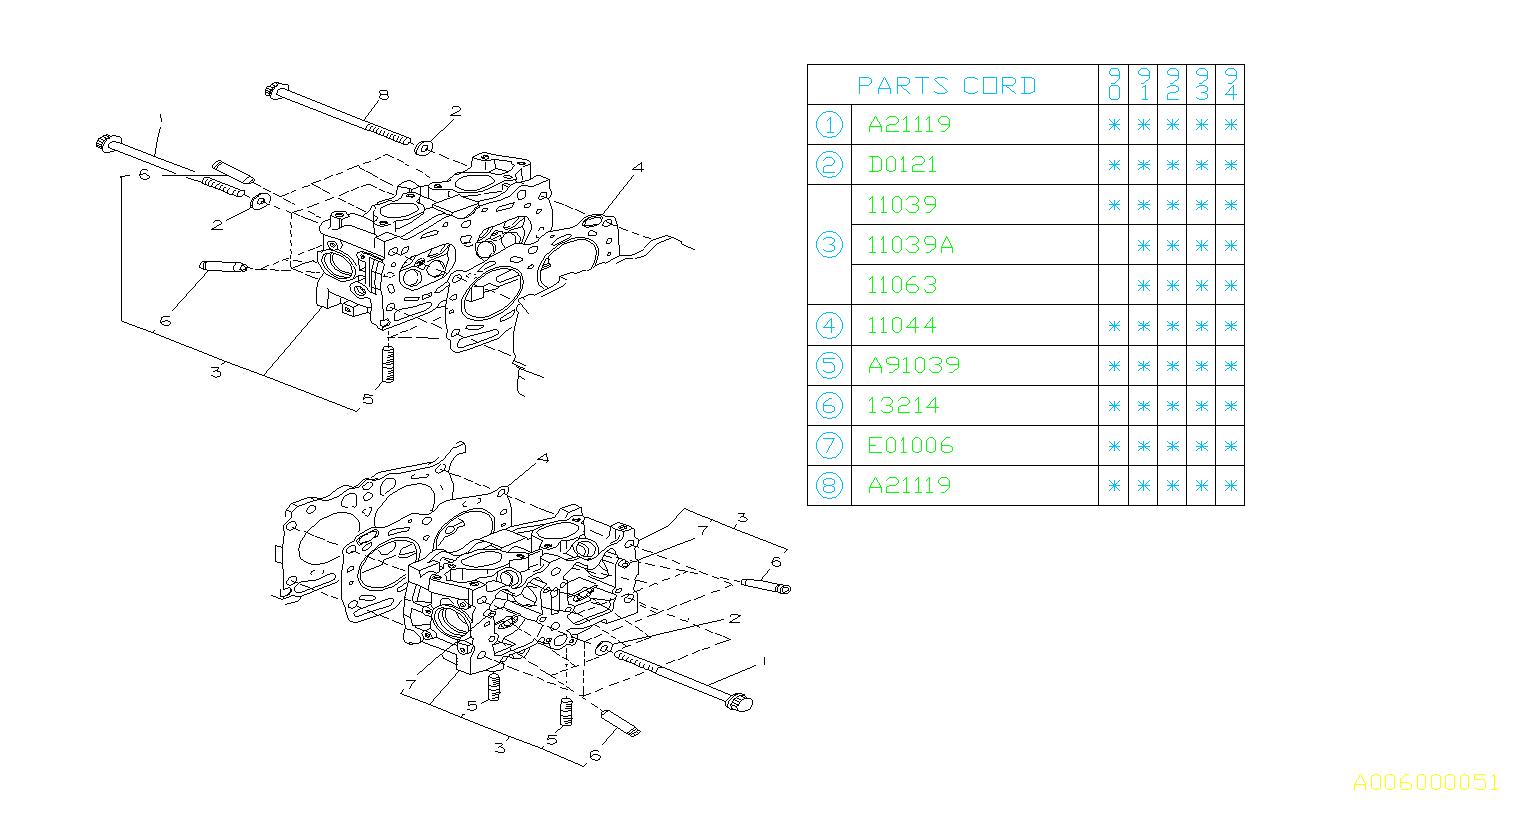 11095aa141 - Engine Cylinder Head Bolt